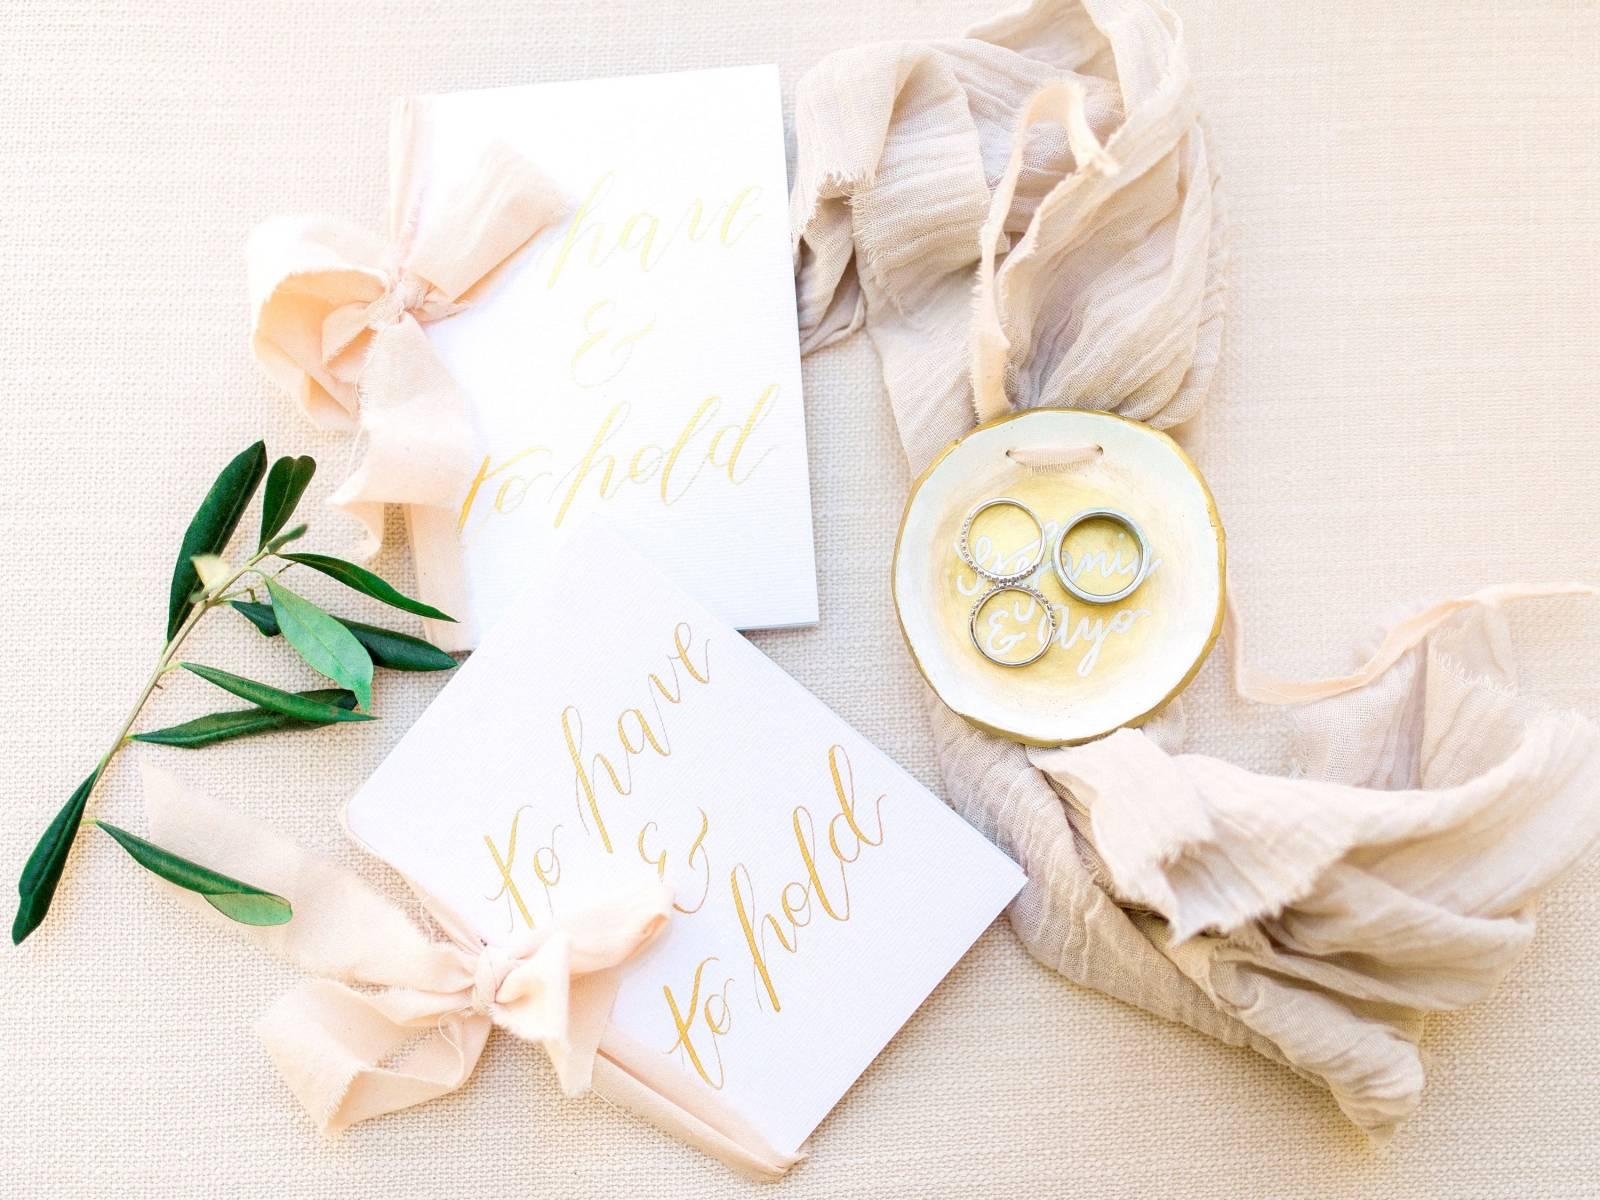 Touch of Gold - Workshops - Vrijgezellen - Trouwuitnodiging - Huwelijksuitnodiging - Kalligrafie - House of Weddings - 9